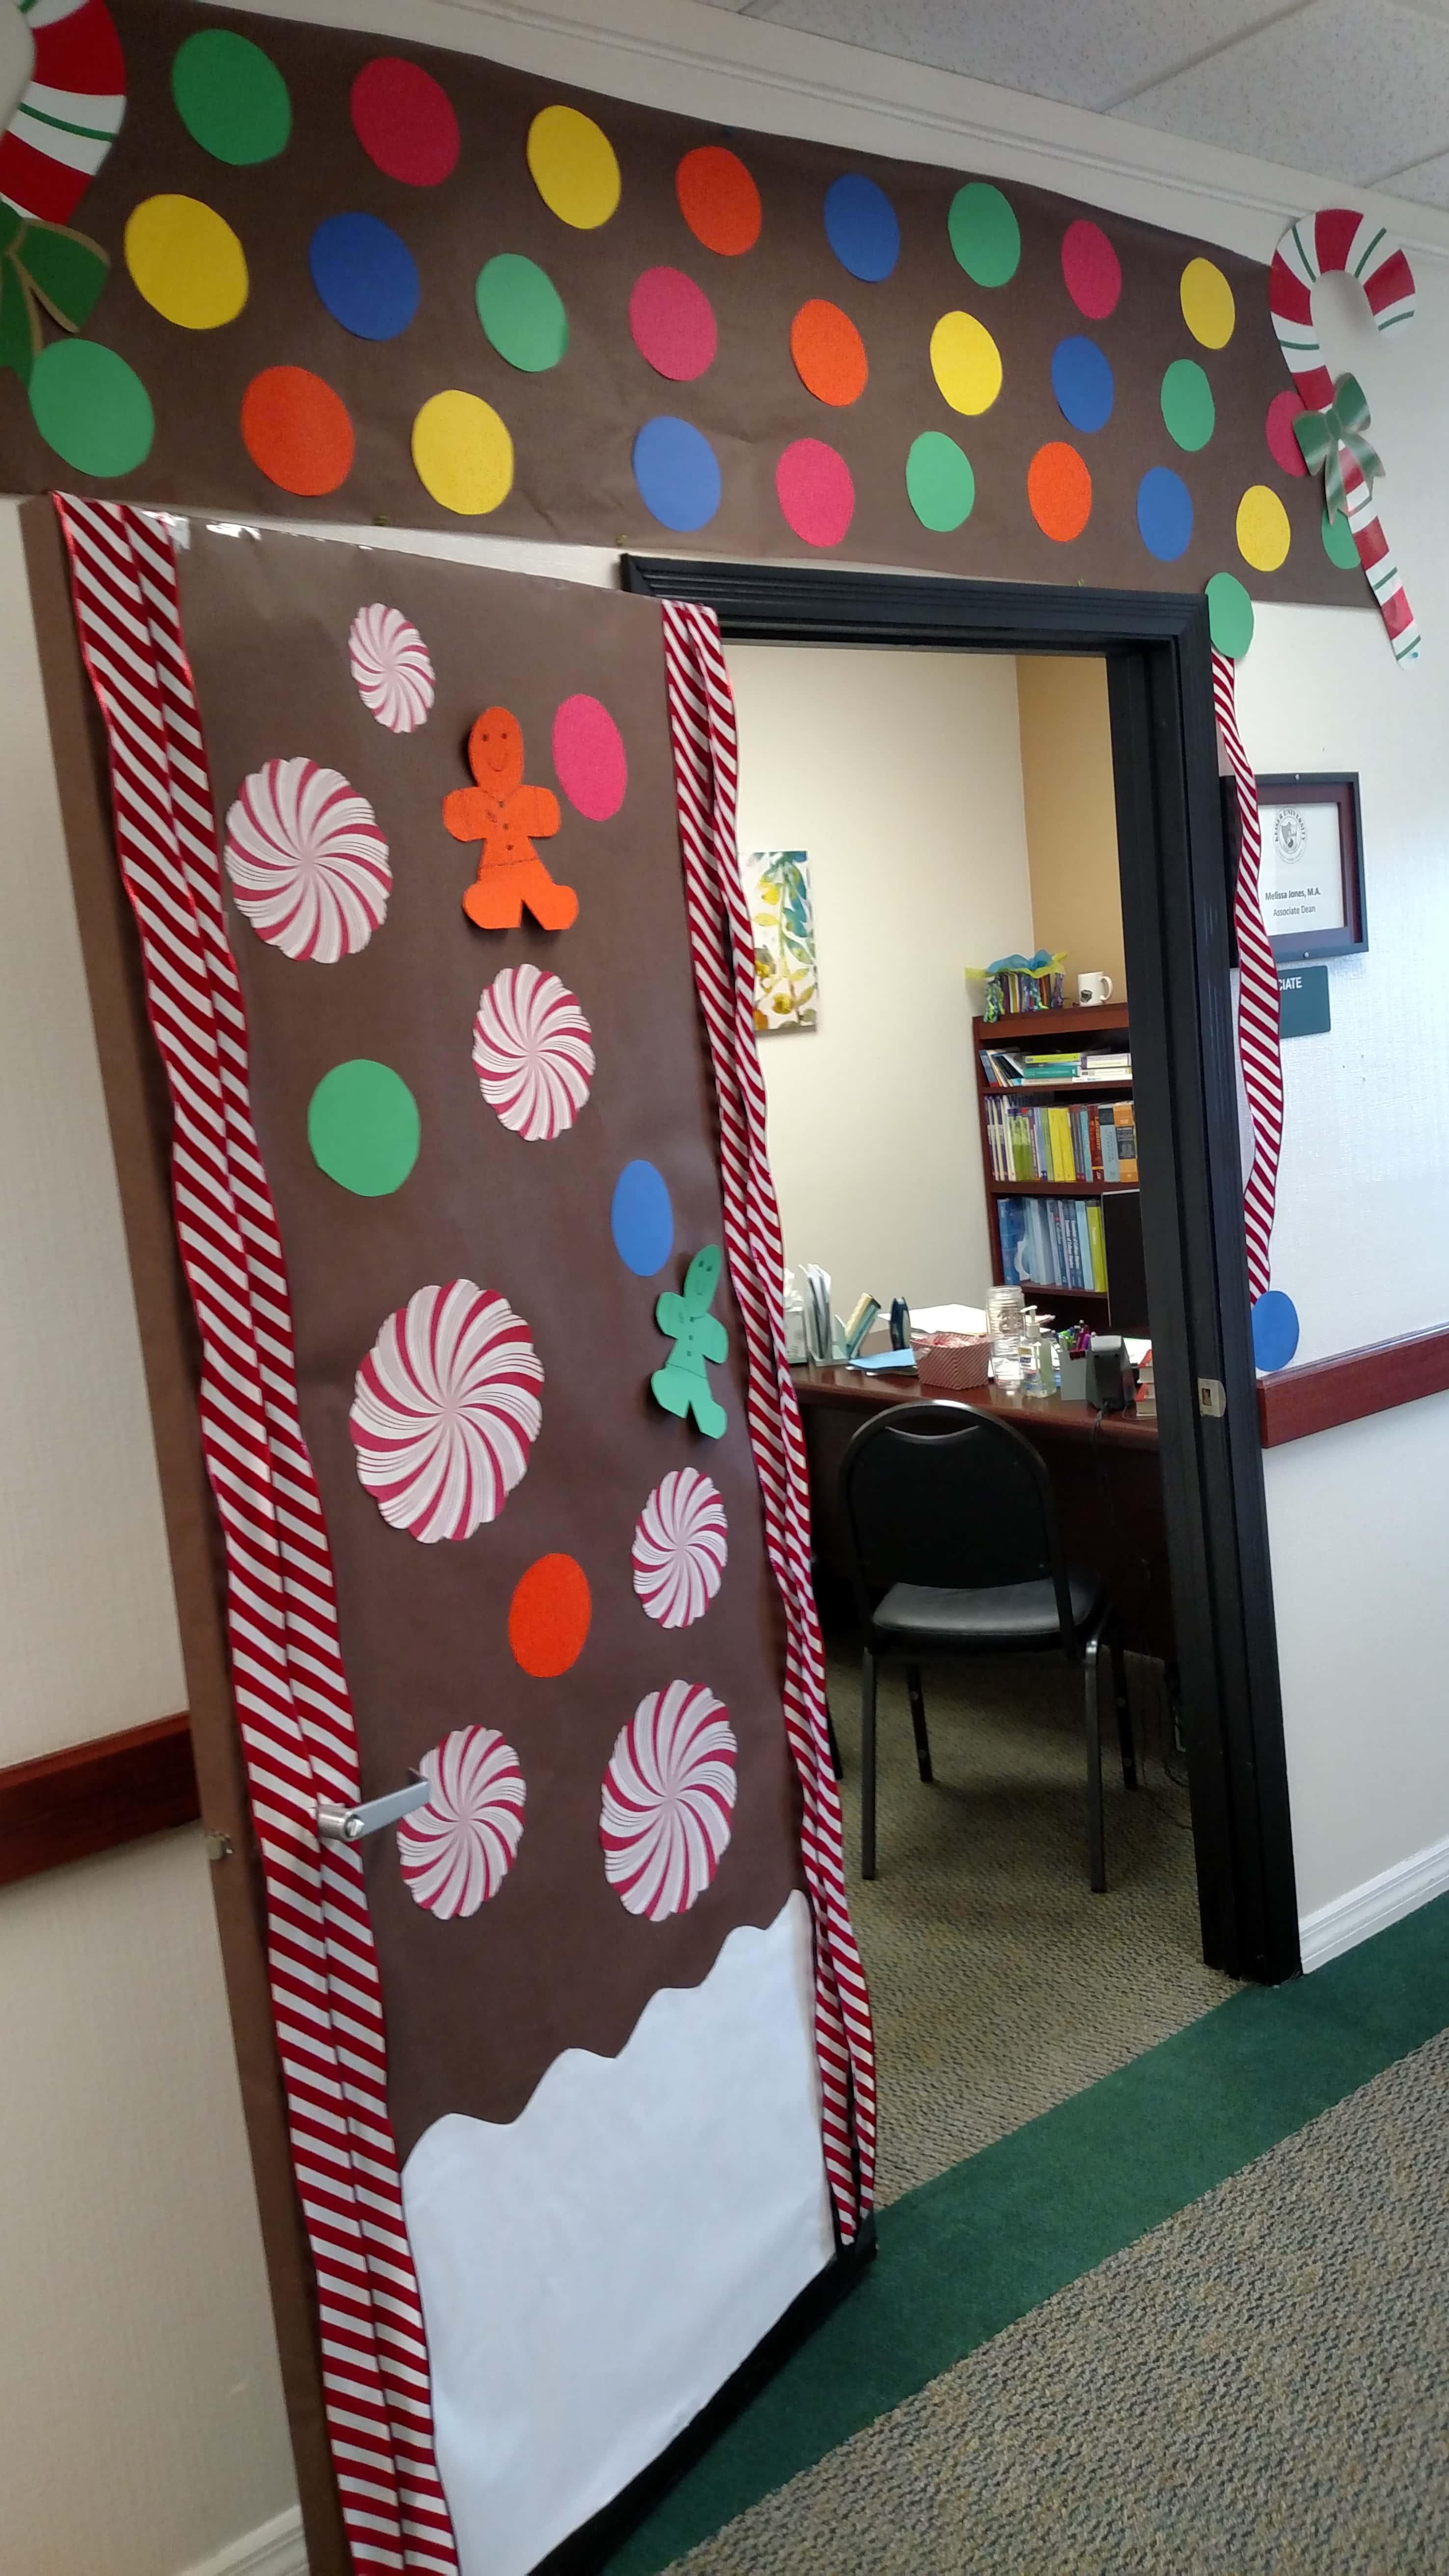 orlando holds a door decorating contest